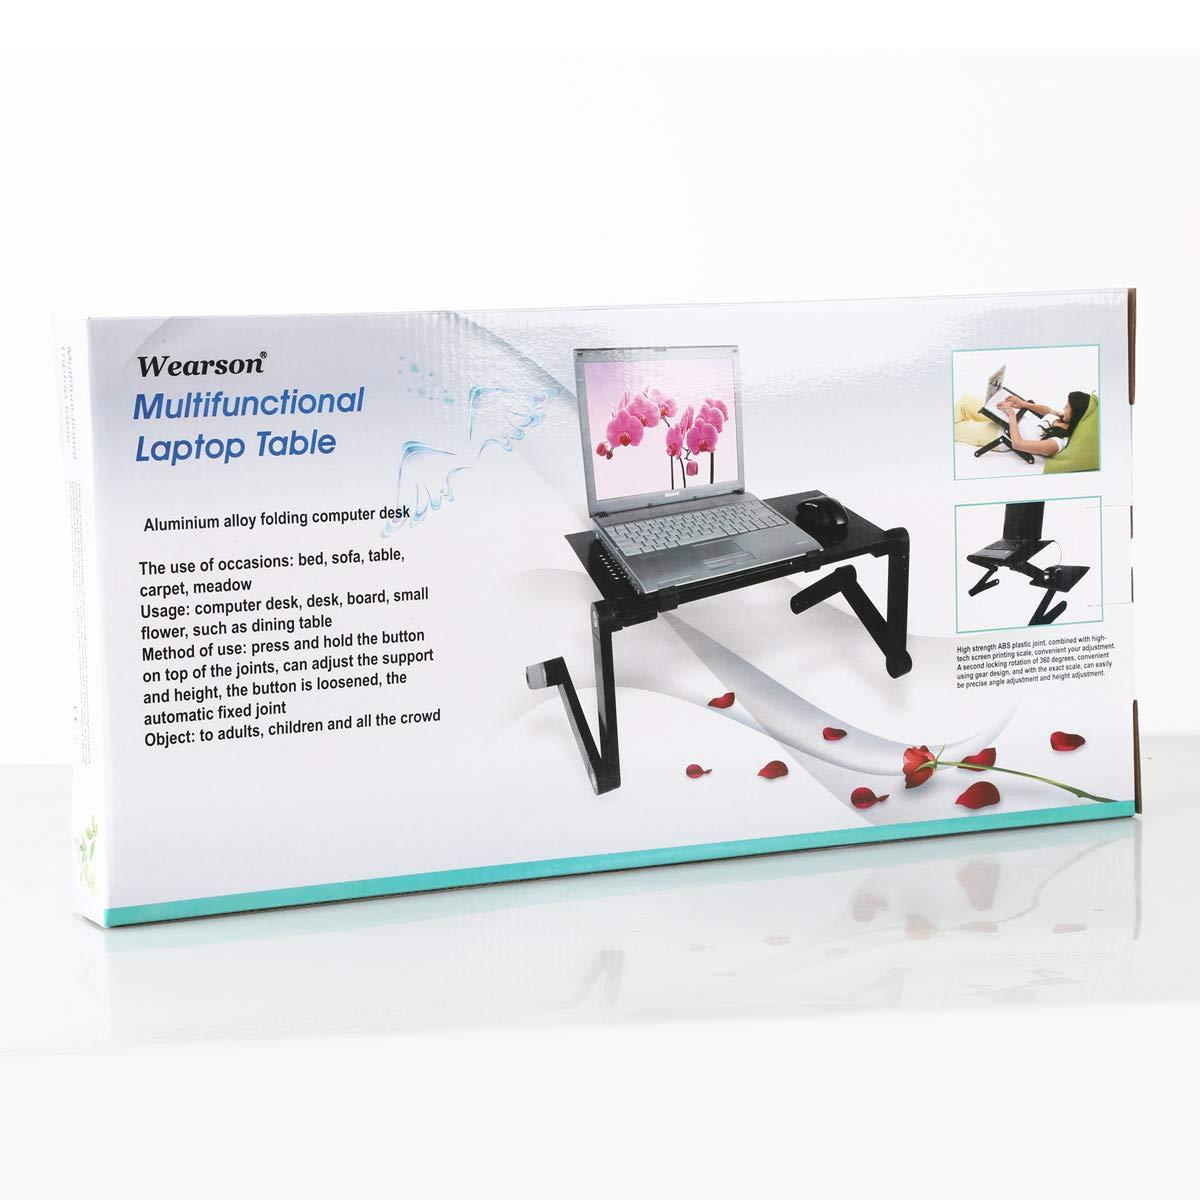 Black Without Fan, 420mm Desk Length Wearson Foldable Laptop Desk Portable Vented Lap Desk Adjustable Folding Aluminum PC Desk/Bed/Sofa Laptop Stand Notebook MacBook Table